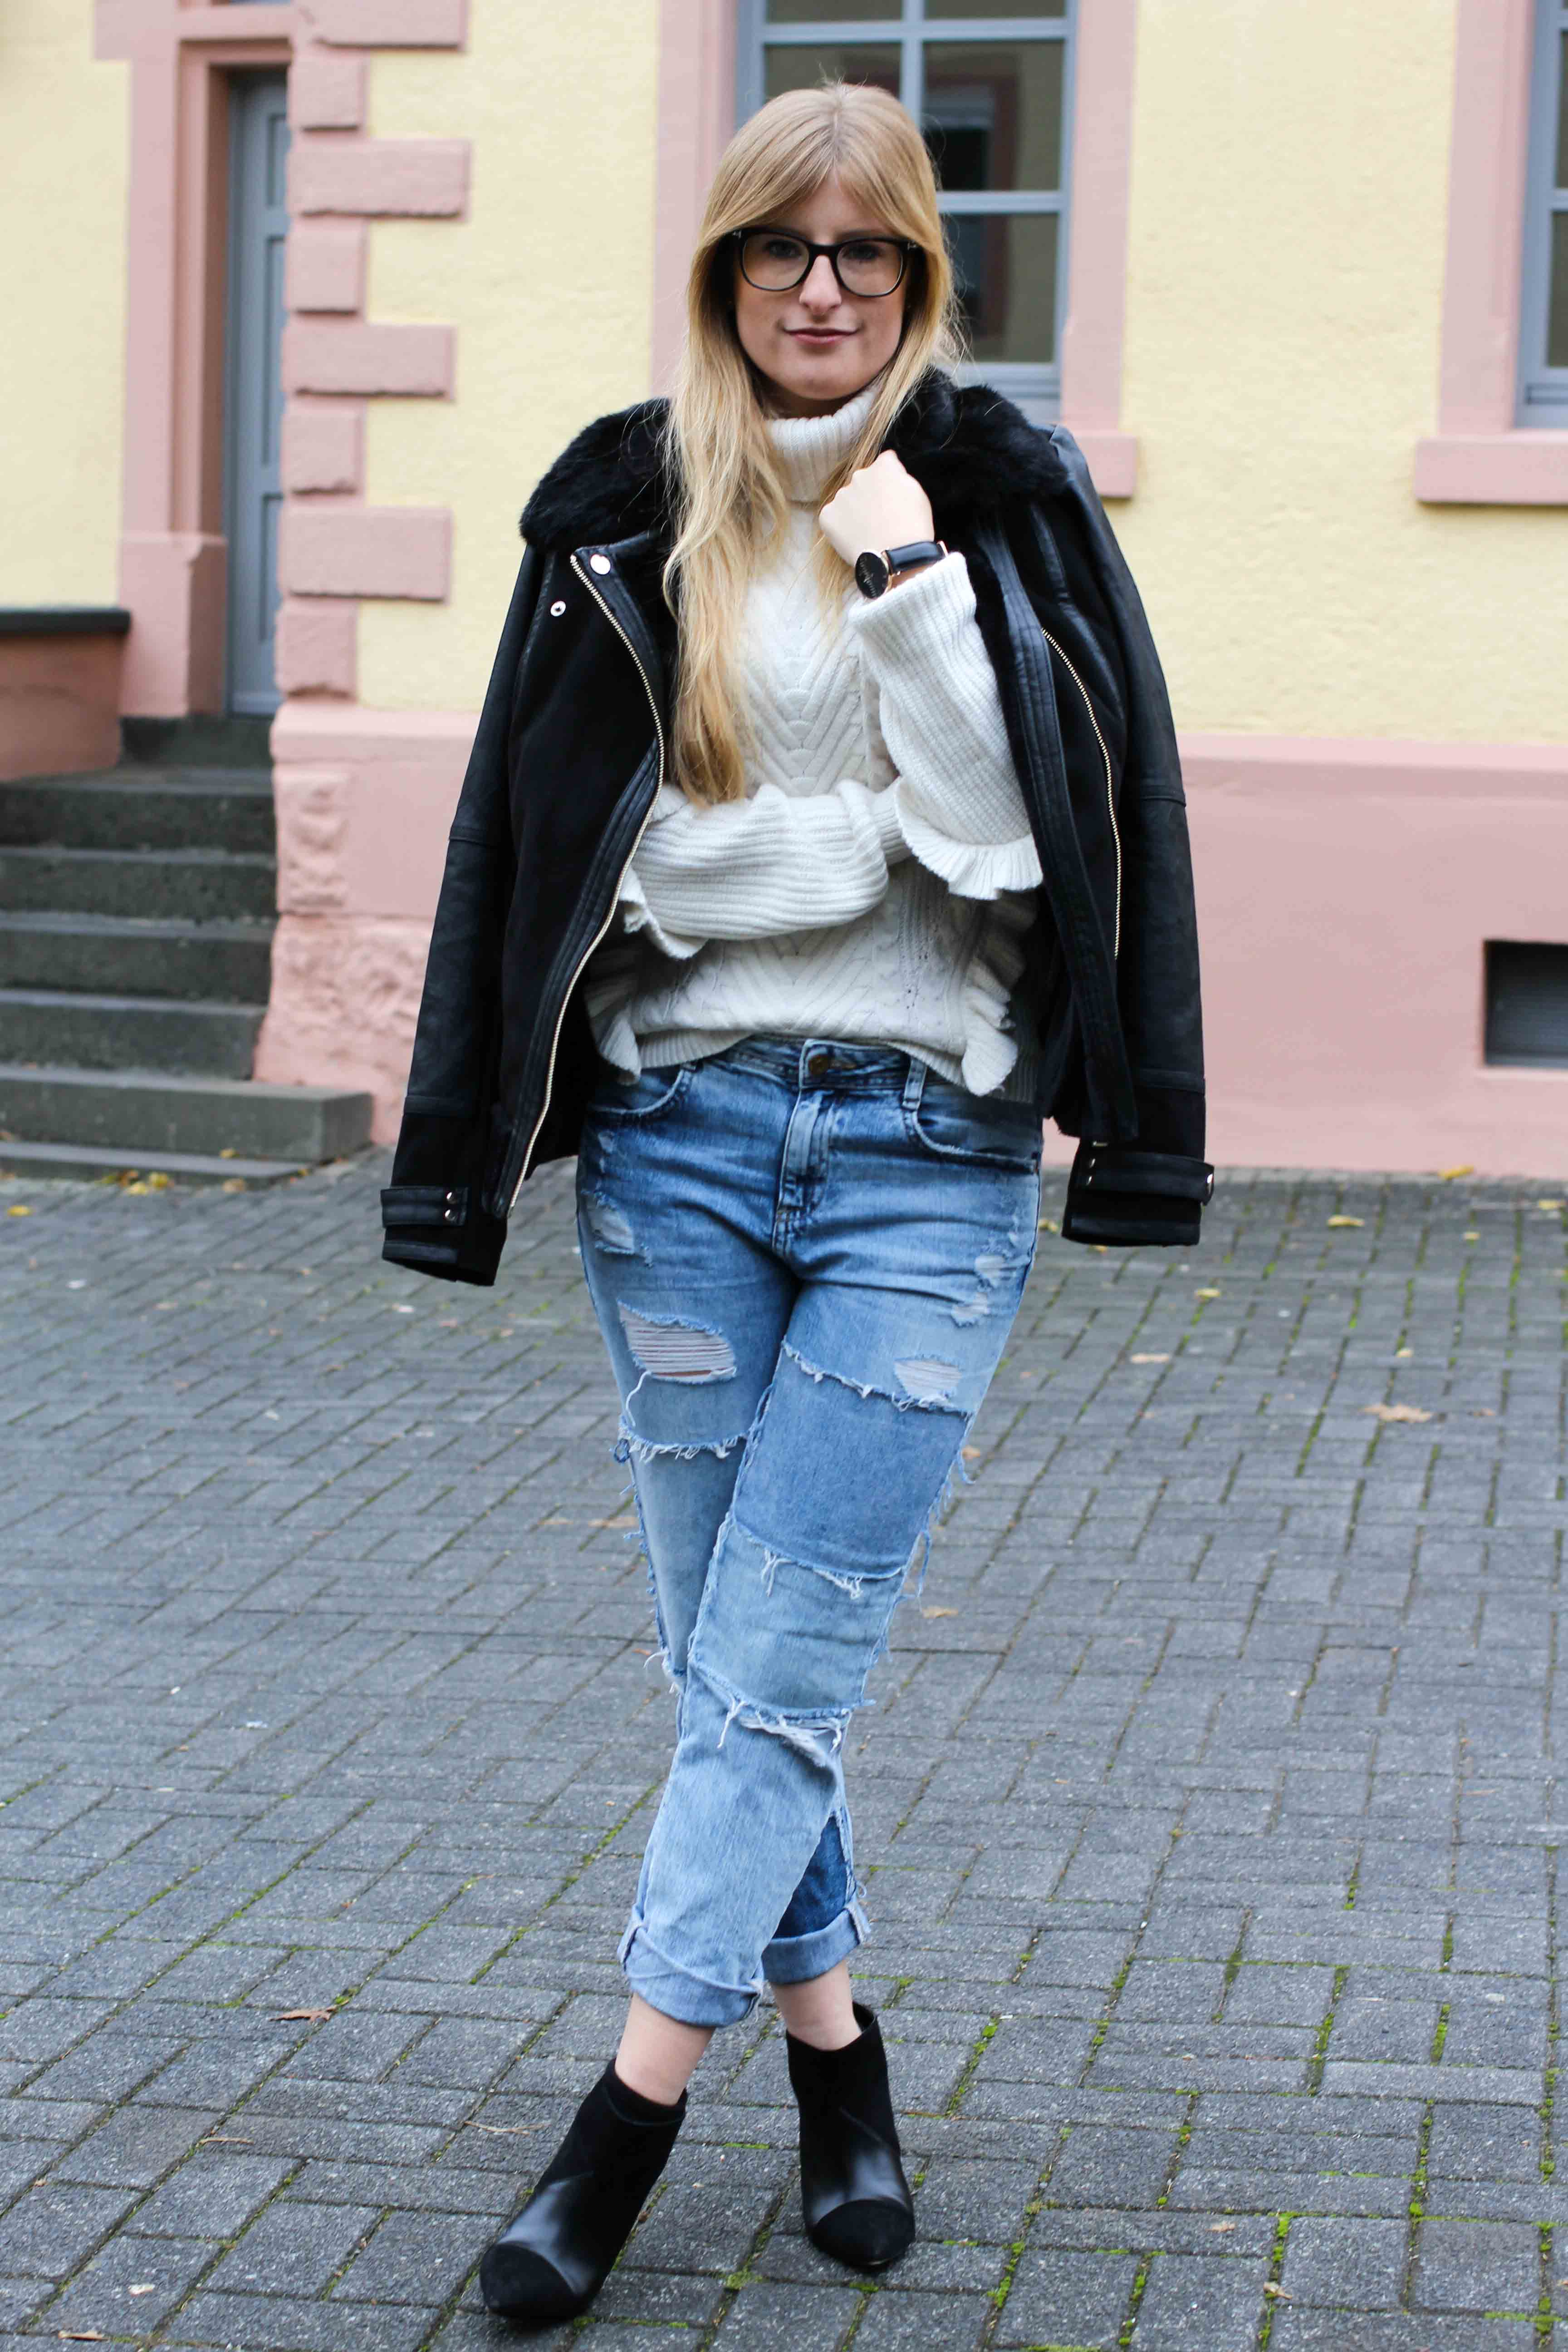 Streetstyle Rüschenpullover kombinieren Jeans Zara Stiefeletten schwarz OOTD Modeblog